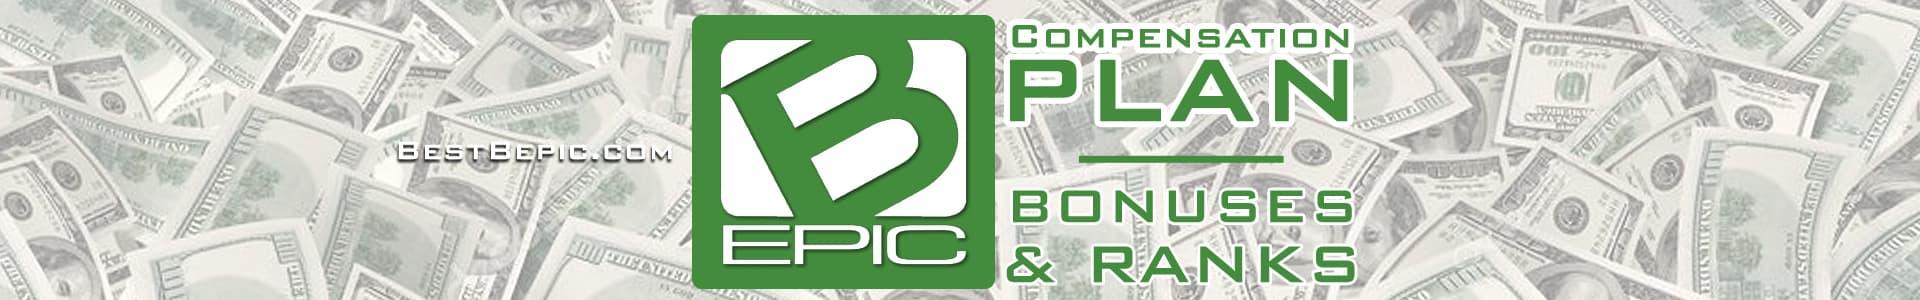 bepic compensation plan